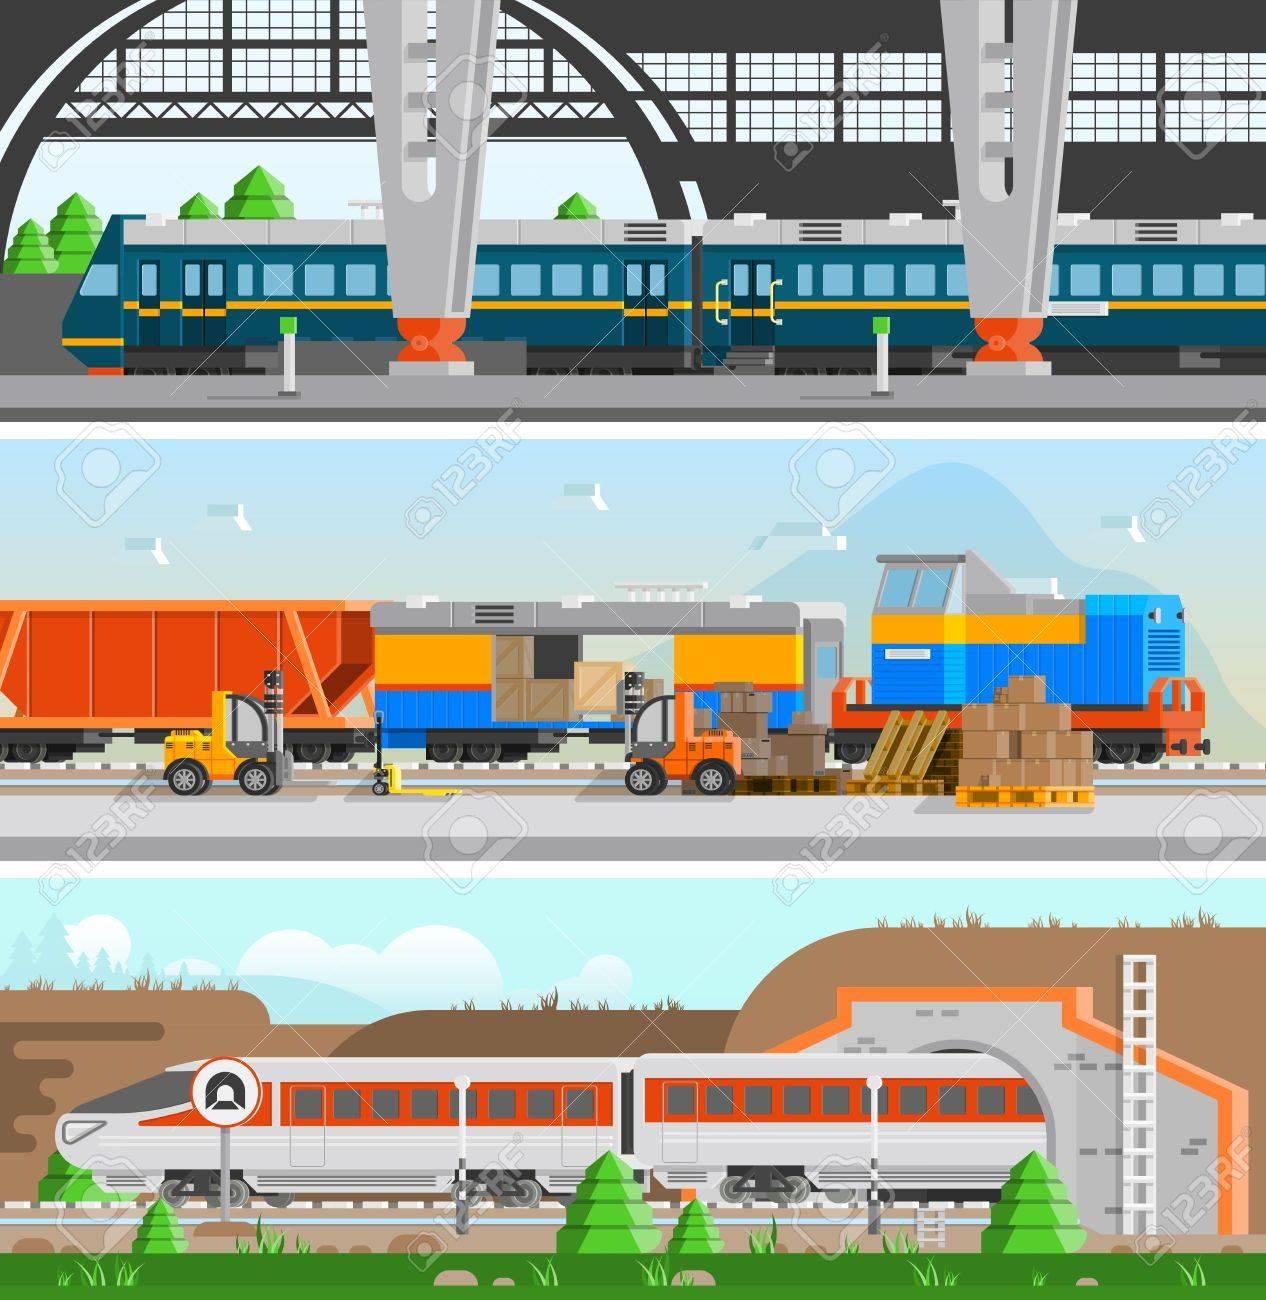 Rail transport horizontal flat banners with high speed passenger